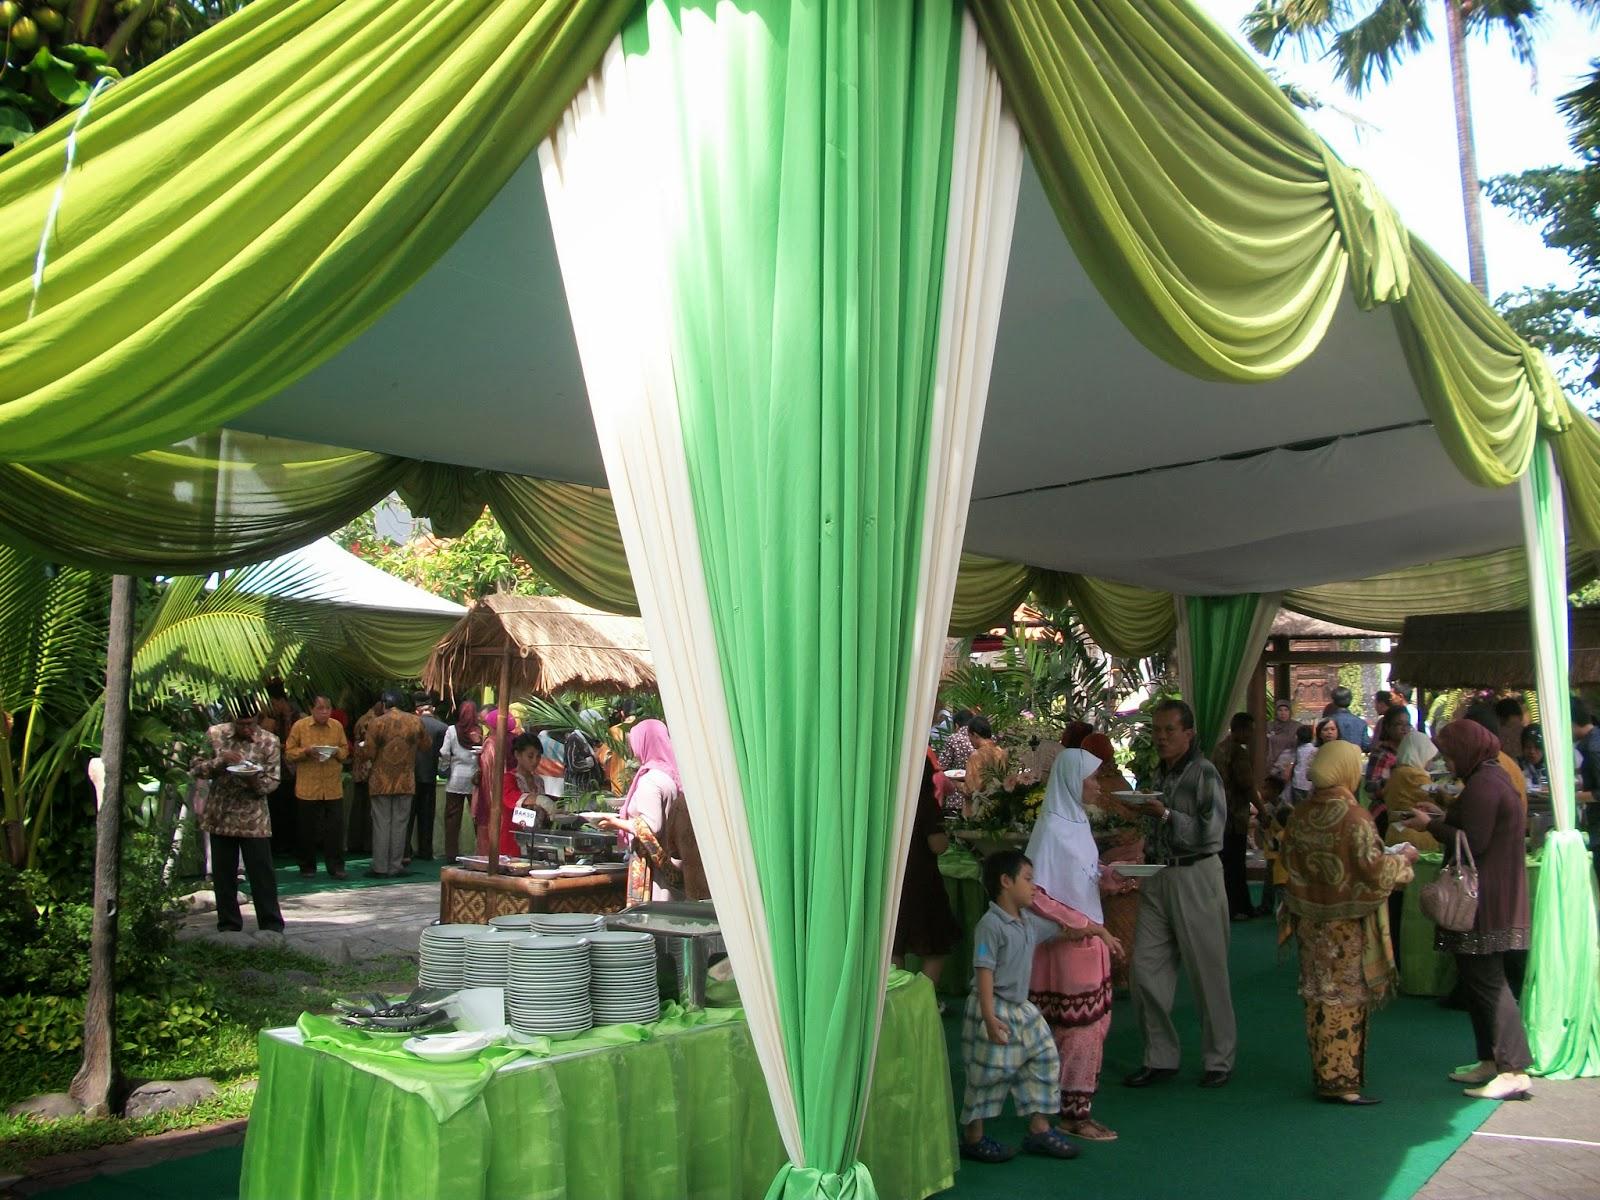 paket dekorasi pelaminan tenda vip